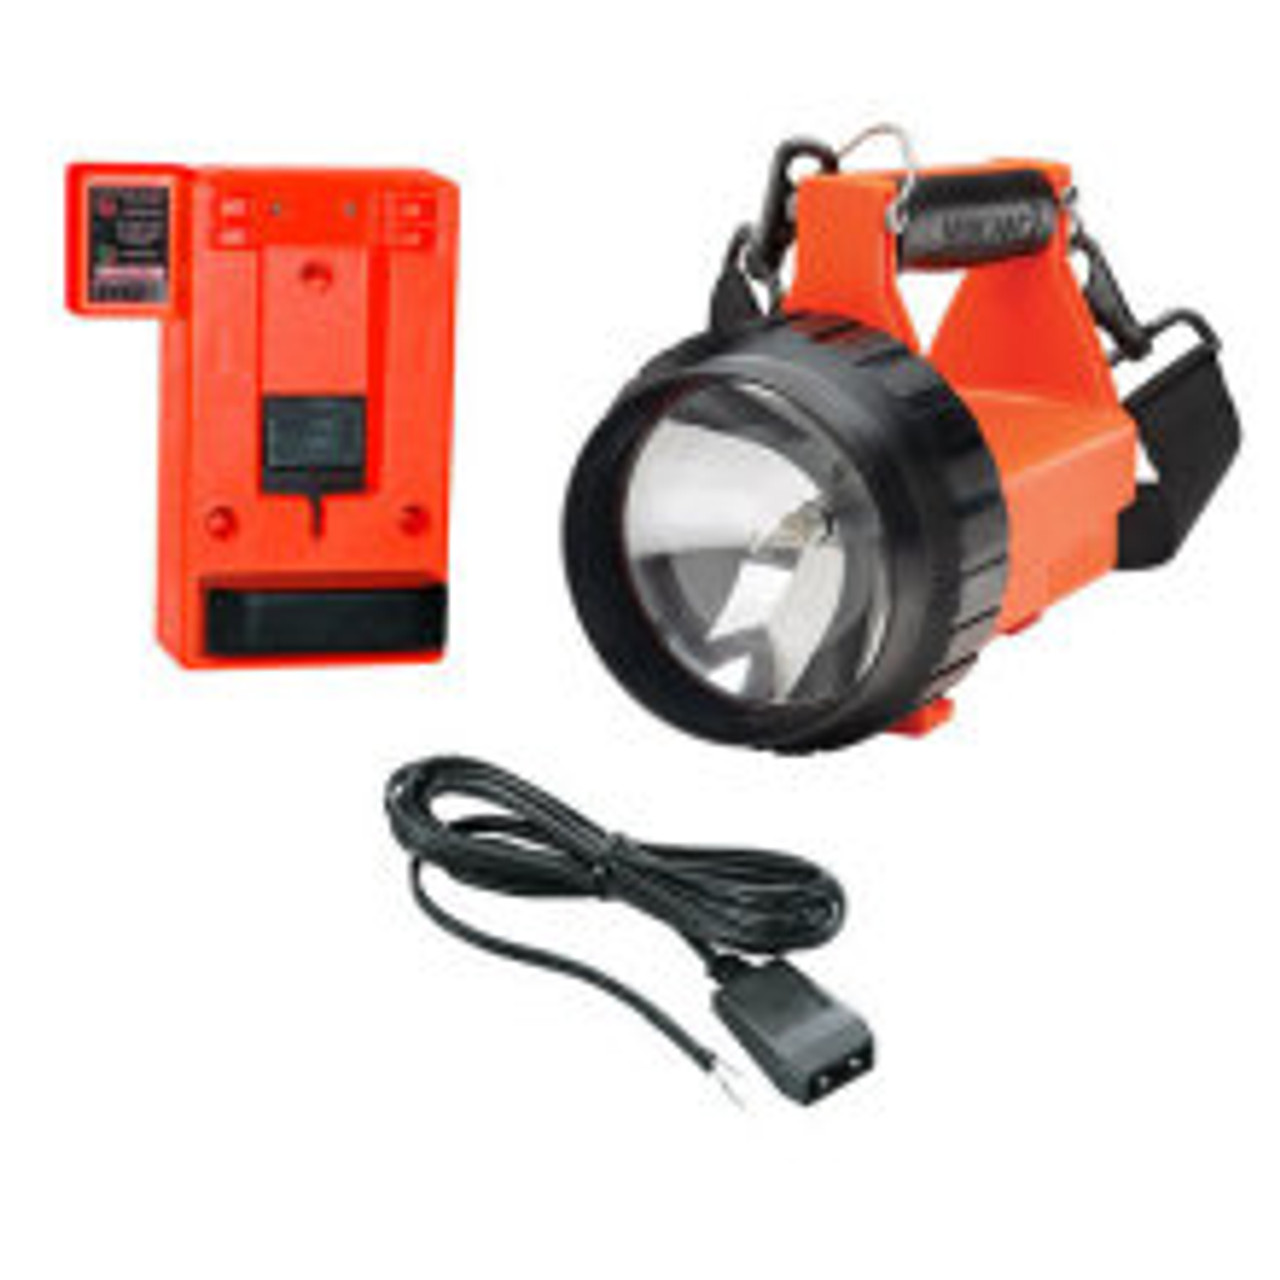 Streamlight Fire Vulcan Rechargeable Lantern DC